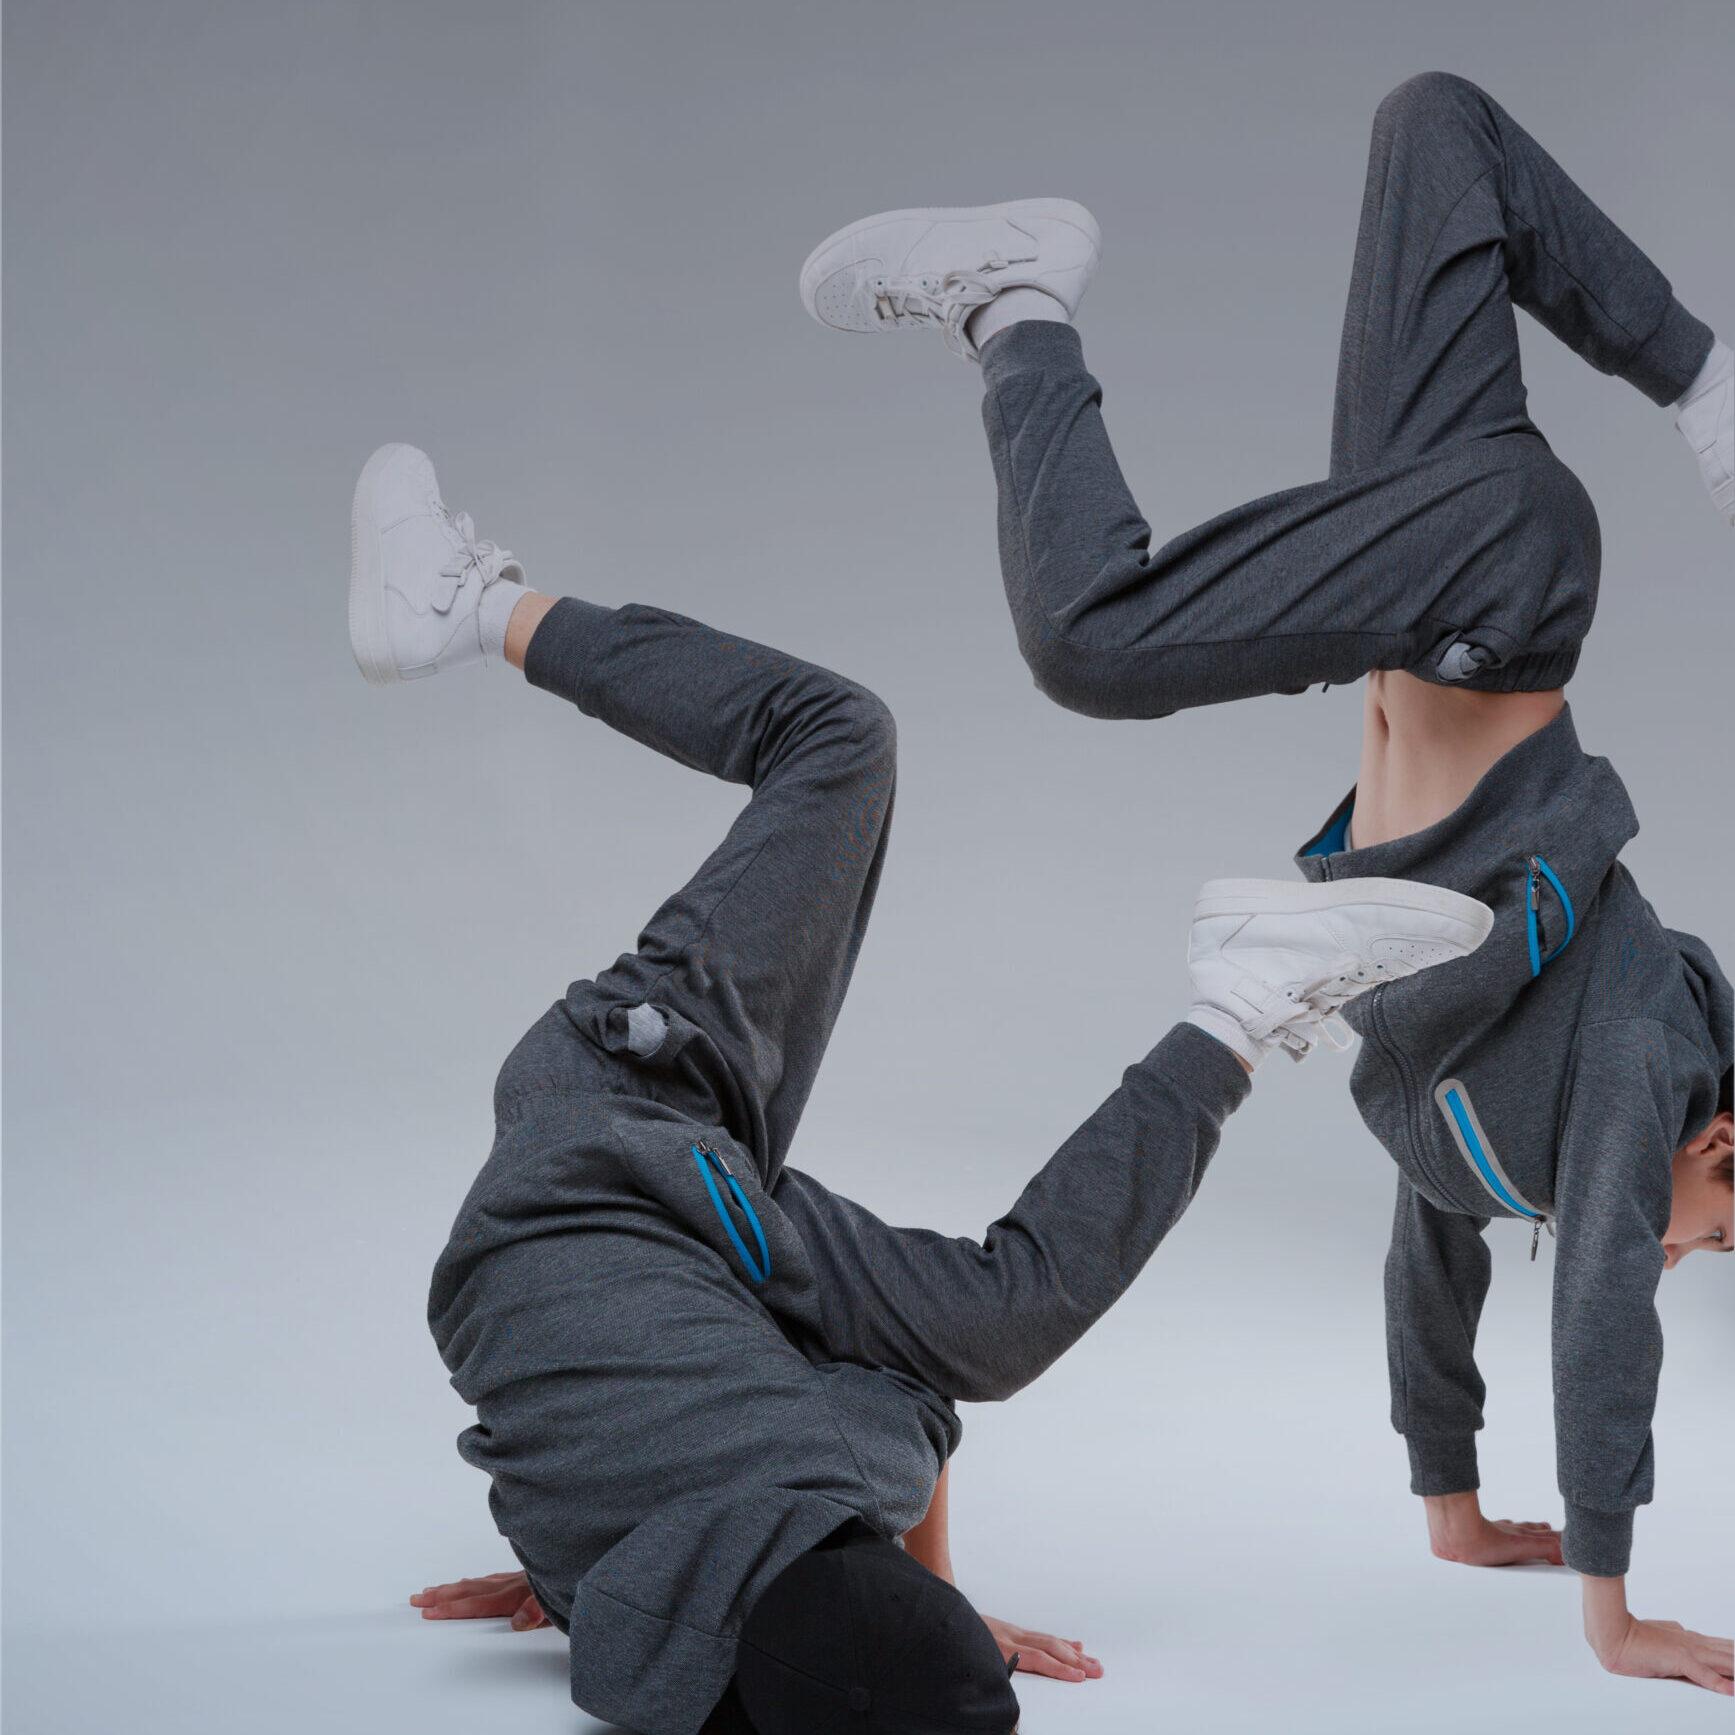 Streetdance/Hiphop, Breakdance, Klassiek ballet of Jazz/Musical dance